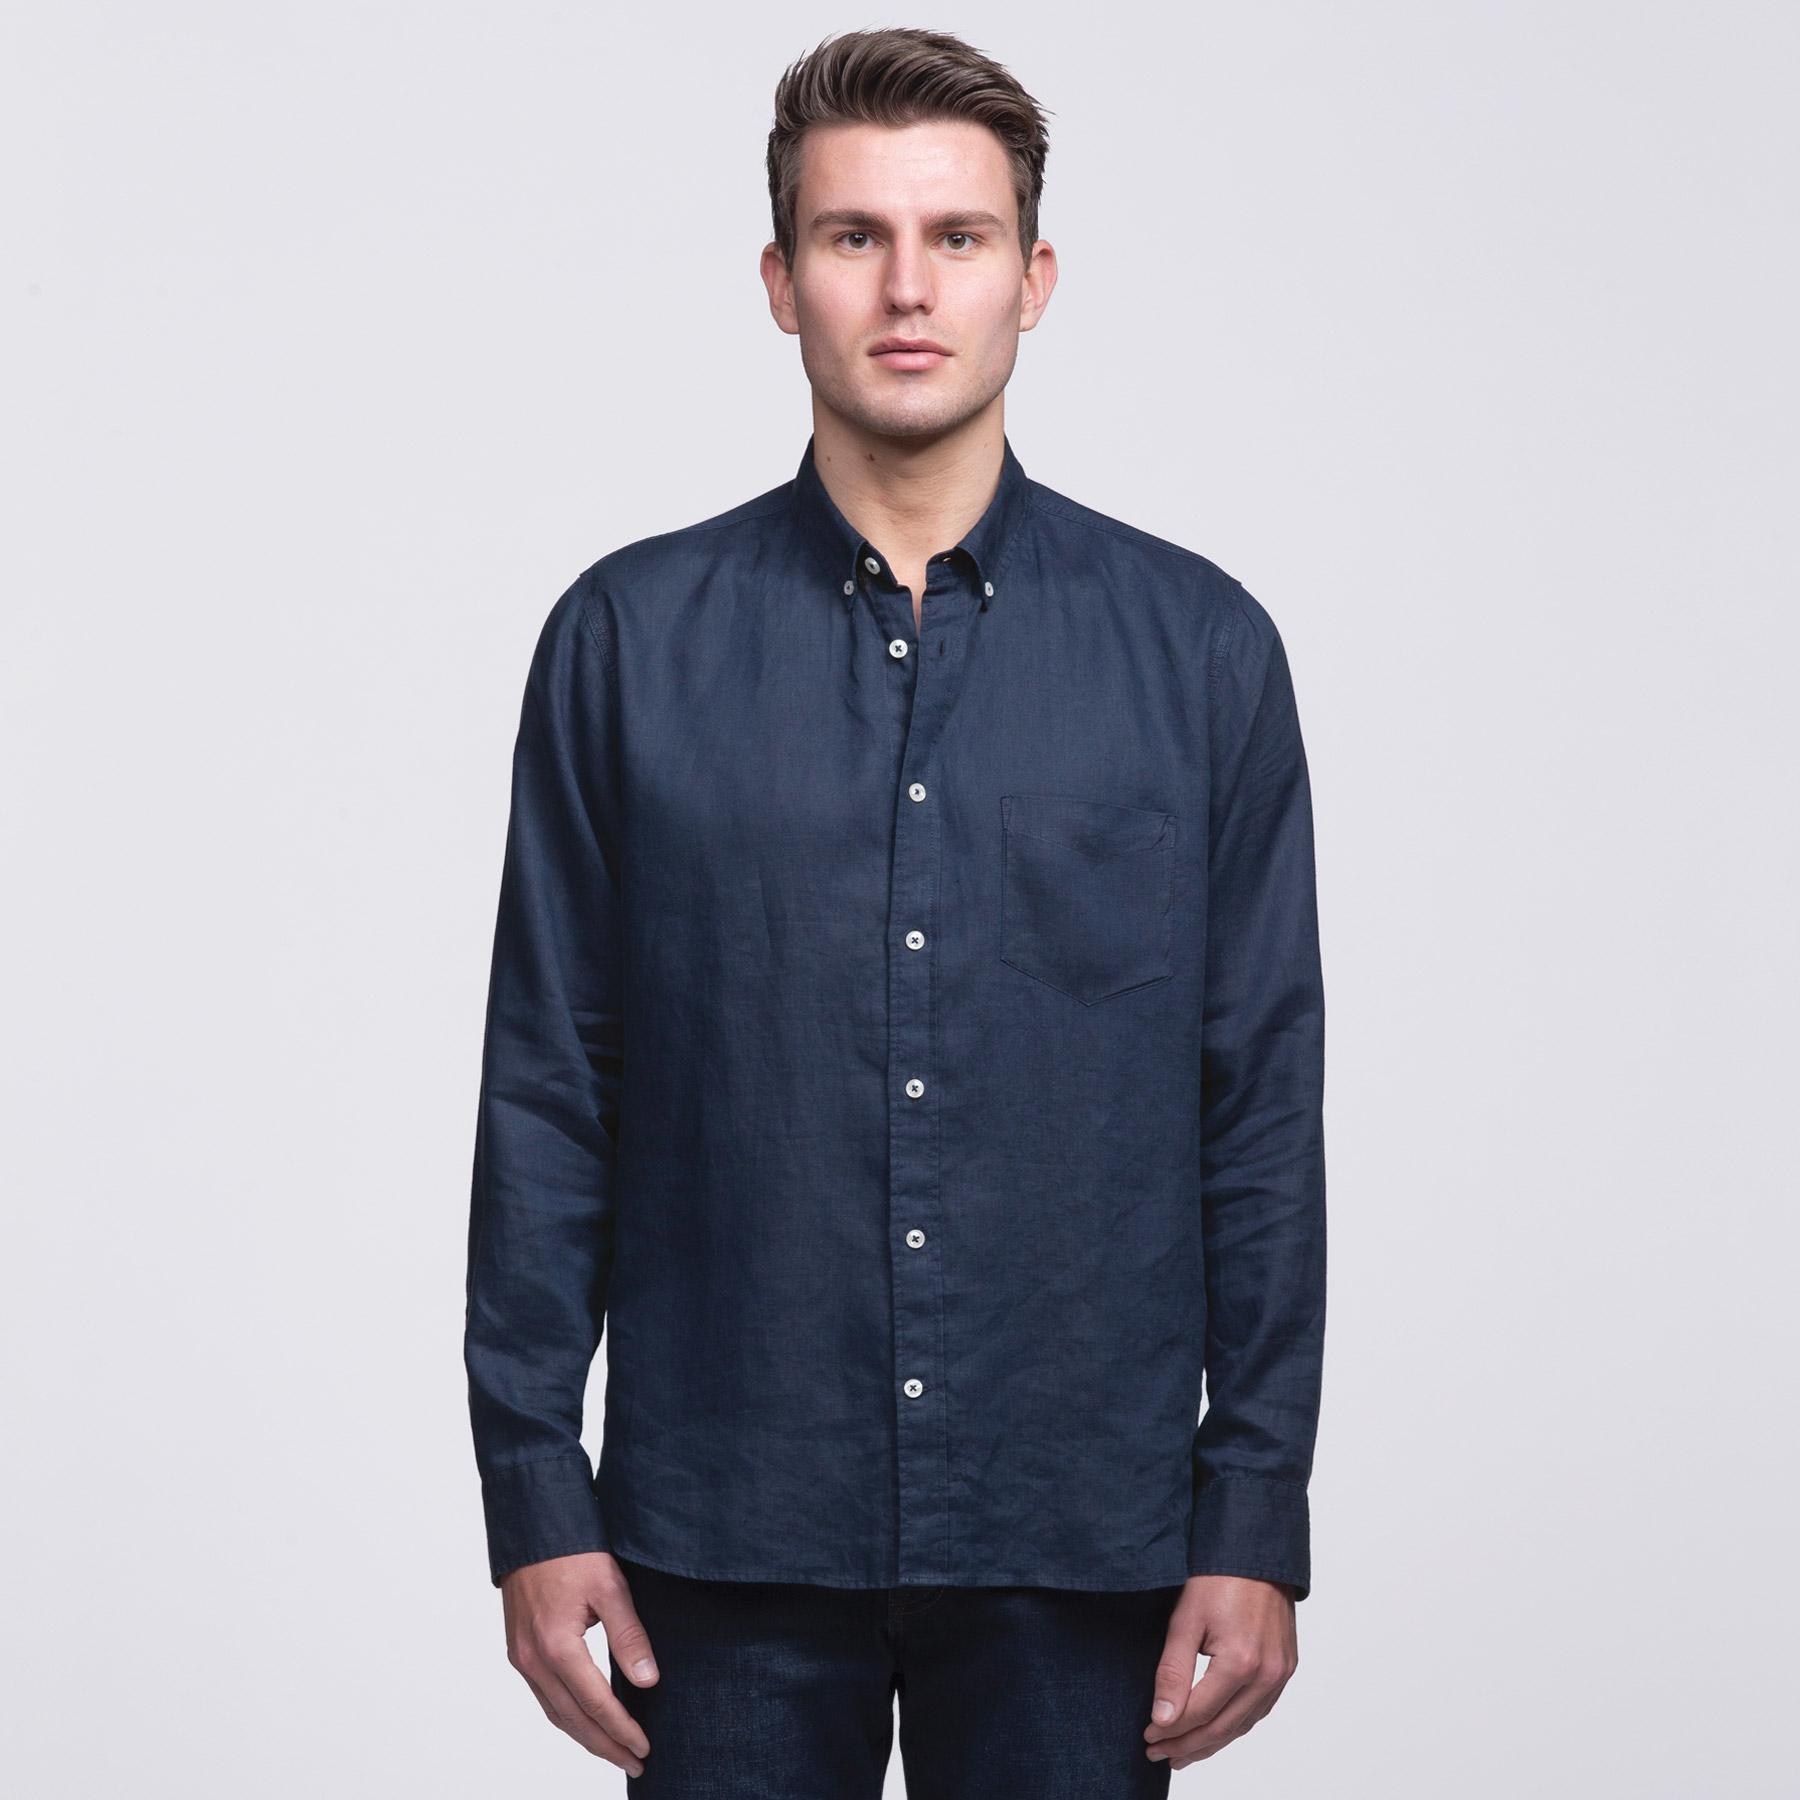 Mens Linen Shirt Siln Impact Print Stitch